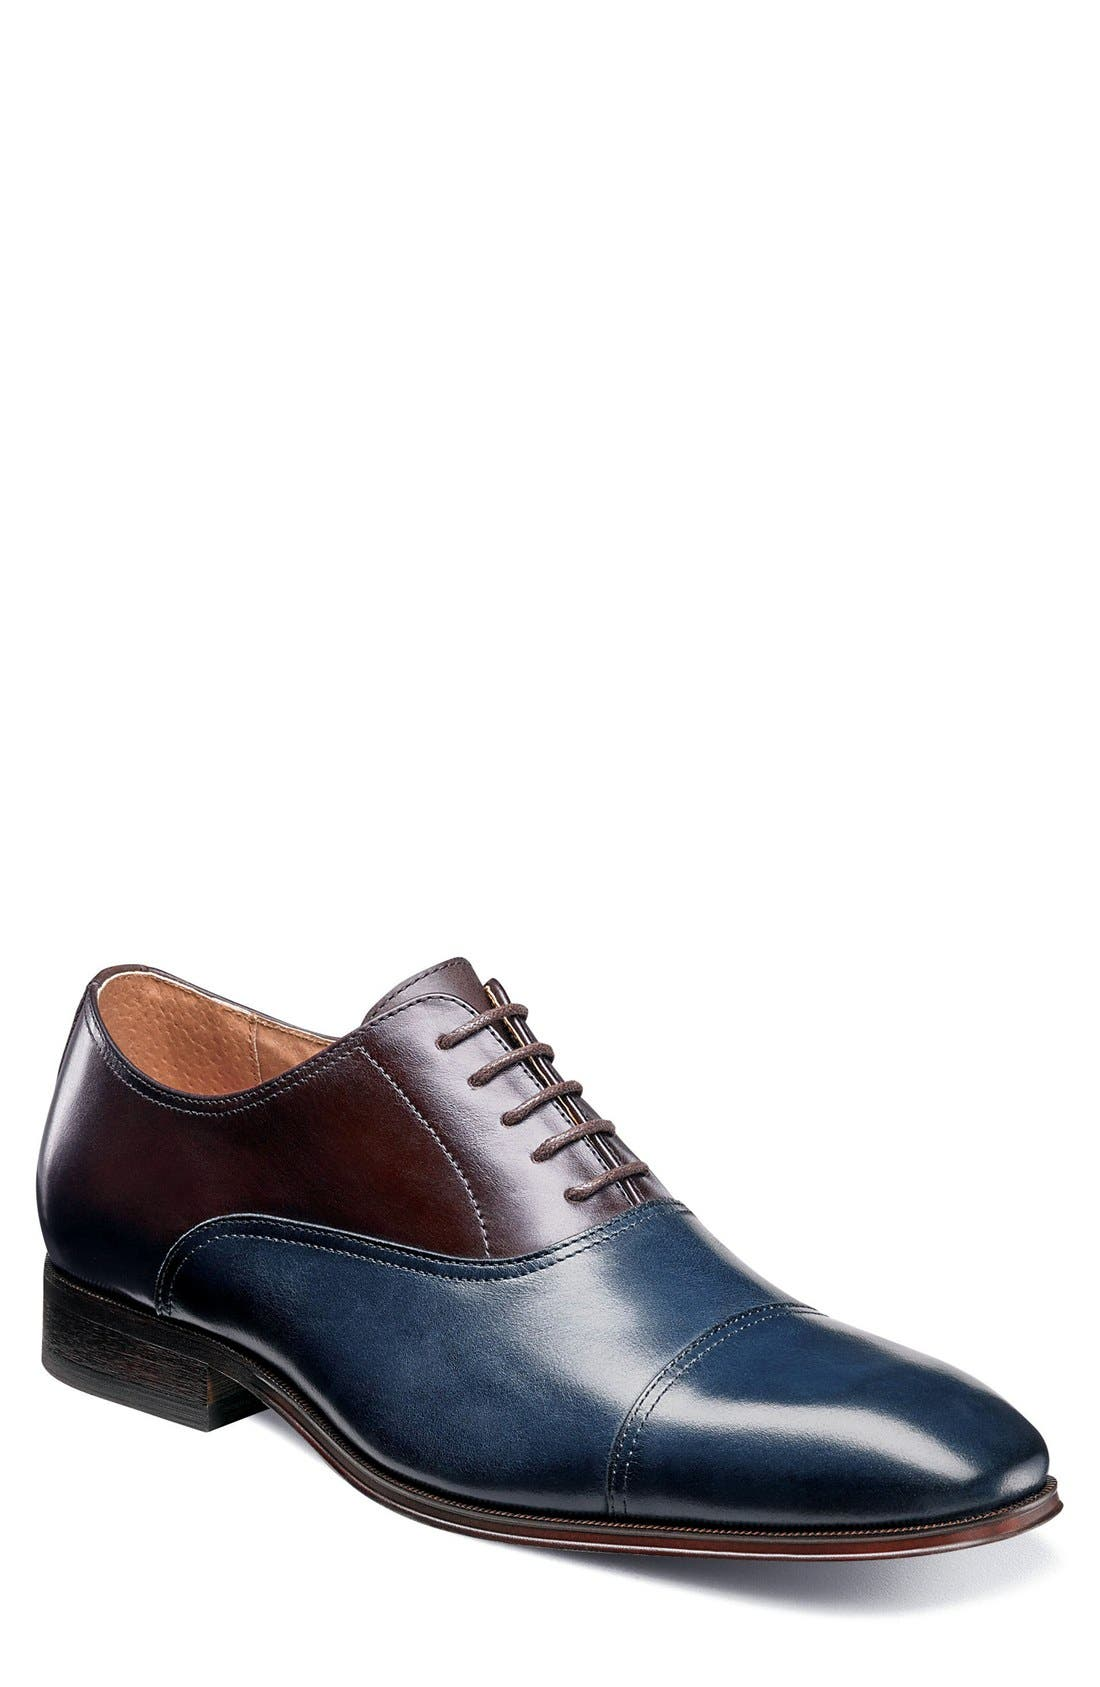 Alternate Image 1 Selected - Florsheim Corbetta Cap Toe Oxford (Men)